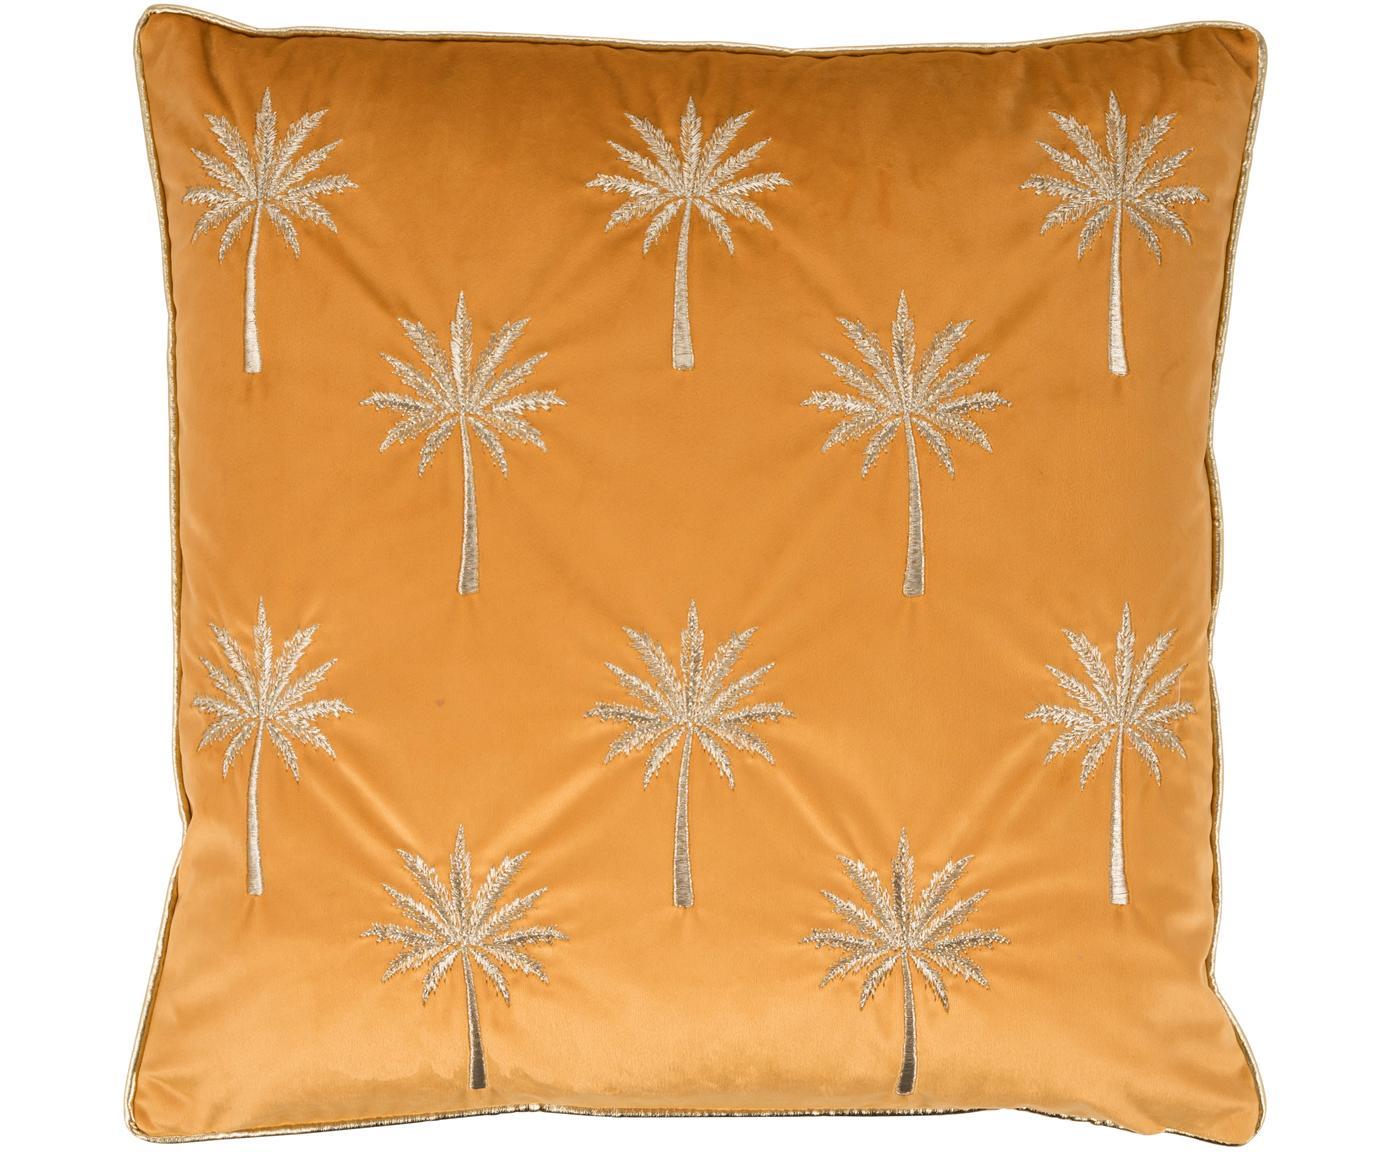 Funda de cojín bordada de terciopelo Palms, Terciopelo (poliéster), Amarillo anaranjado, dorado, An 45 x L 45 cm